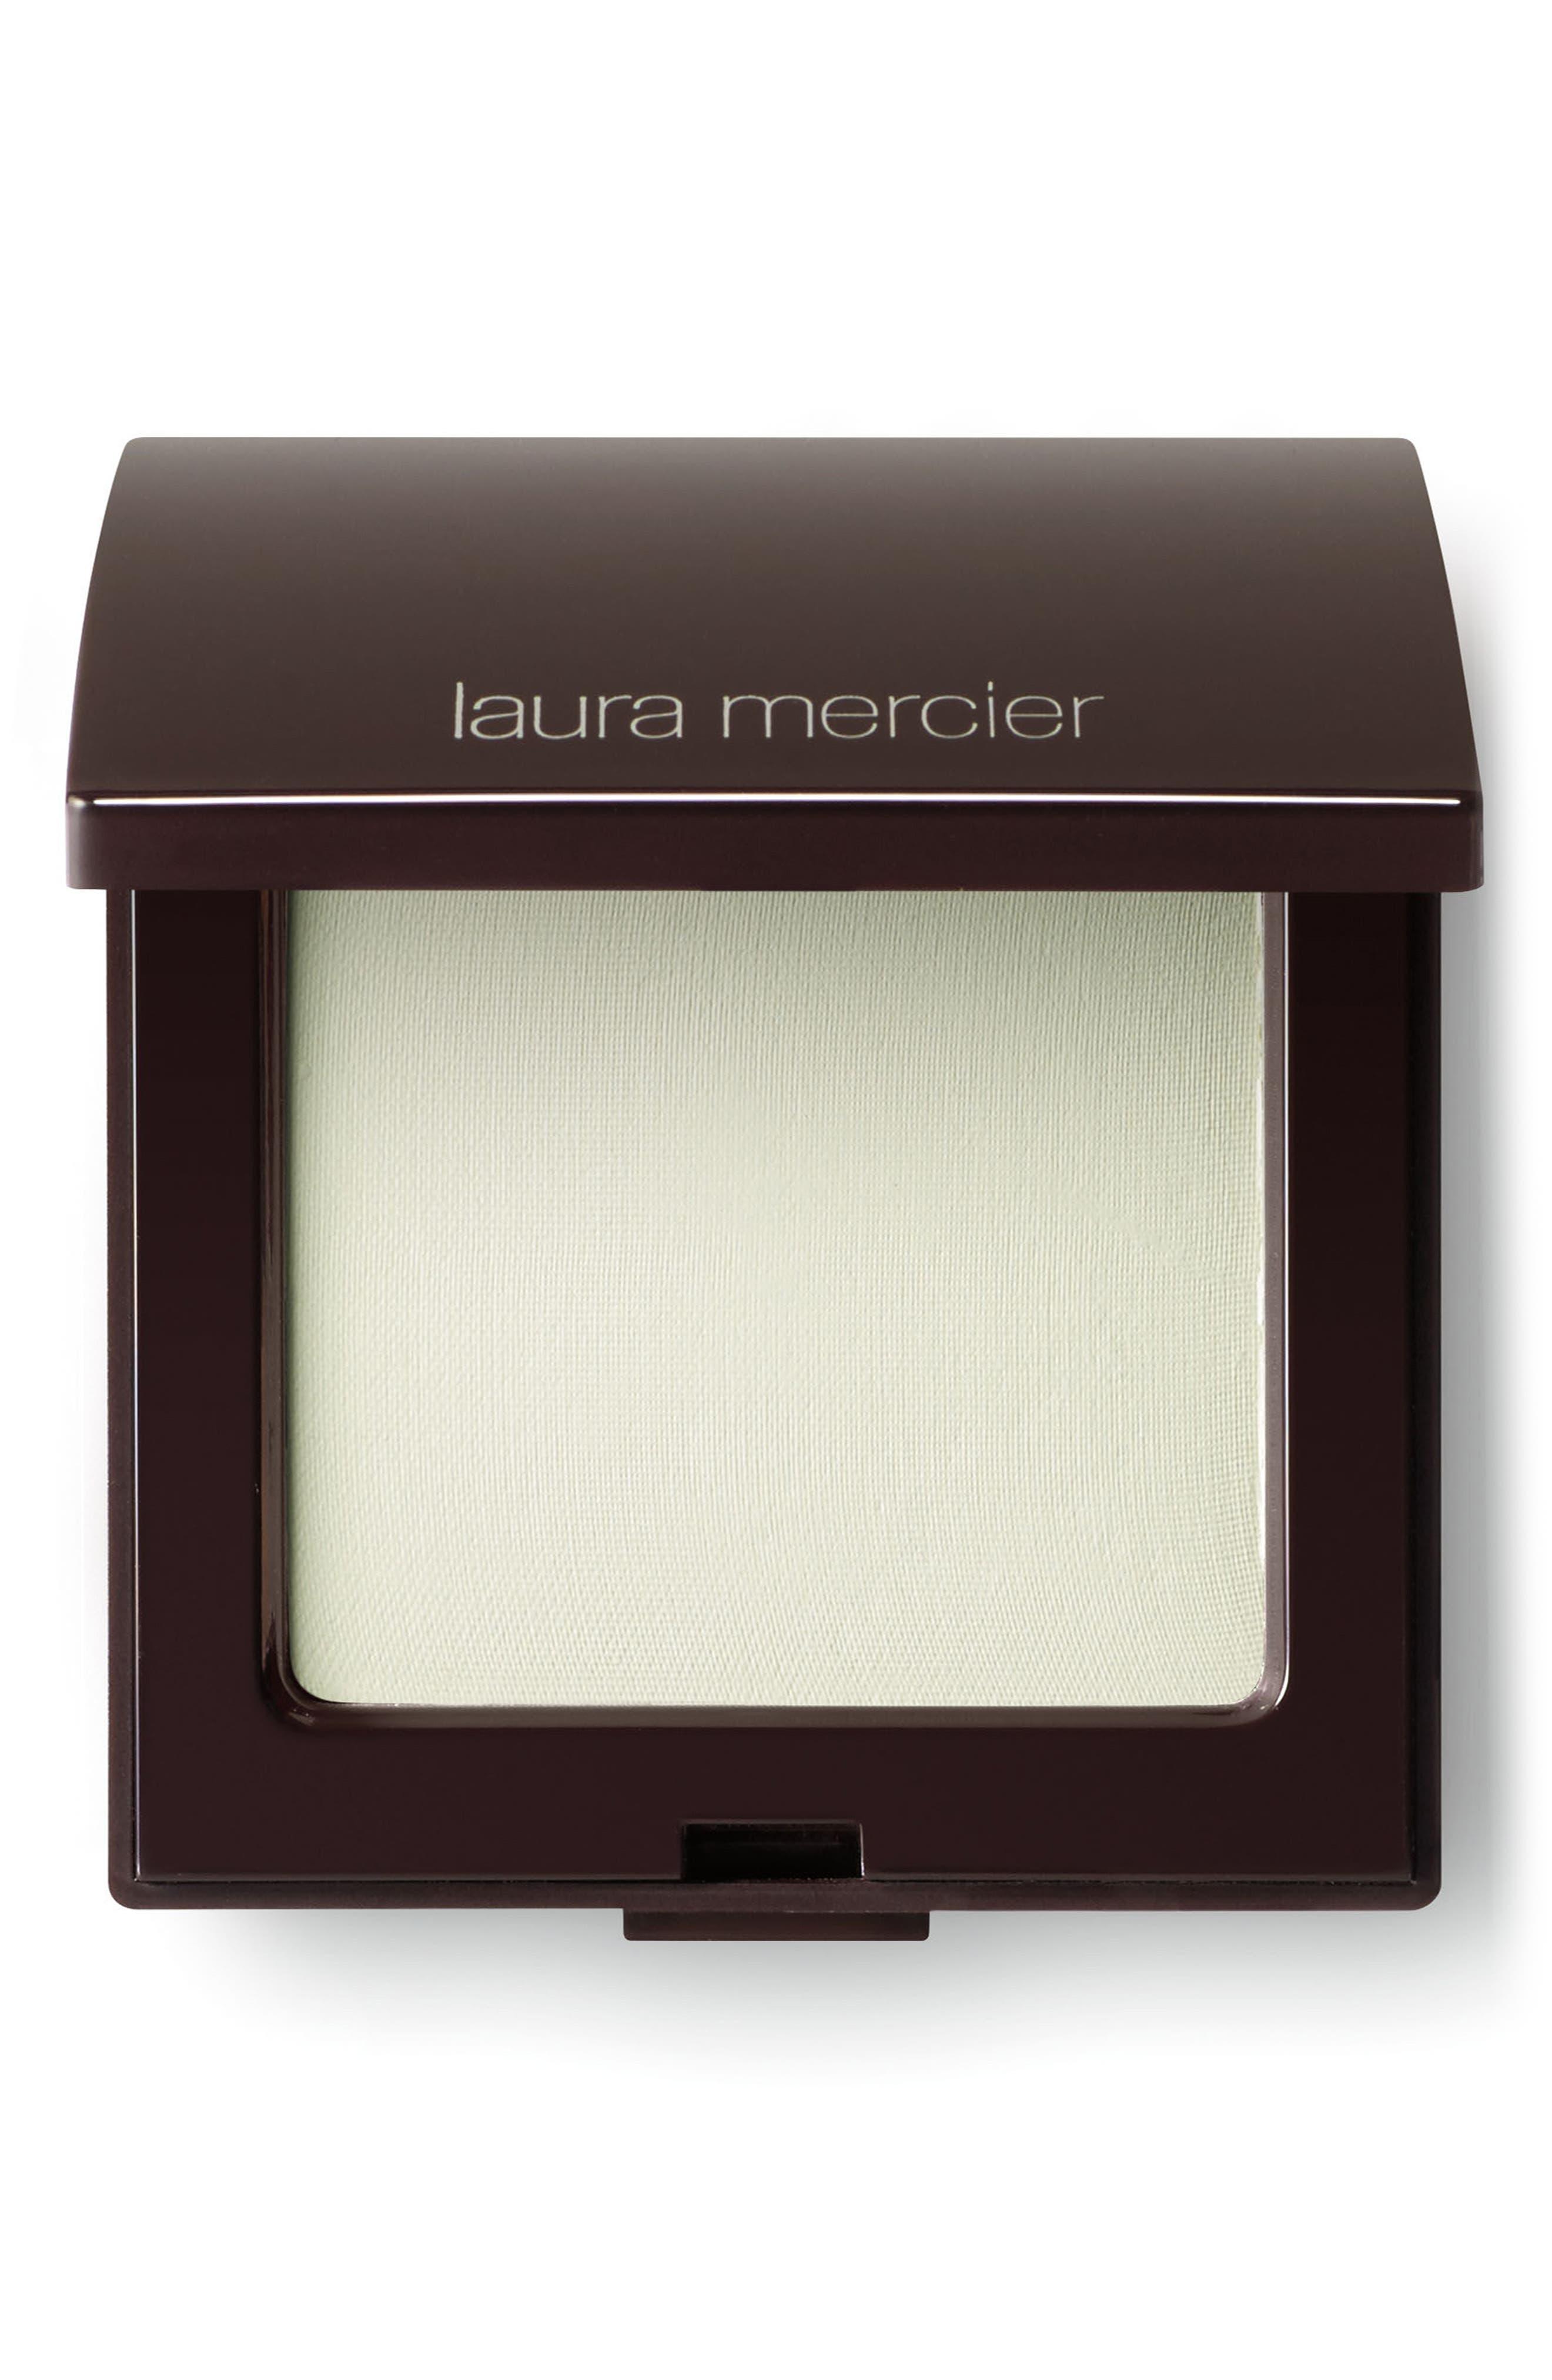 LAURA MERCIER, Shine Control Pressed Setting Powder, Main thumbnail 1, color, MATTE TRANSLUCENT